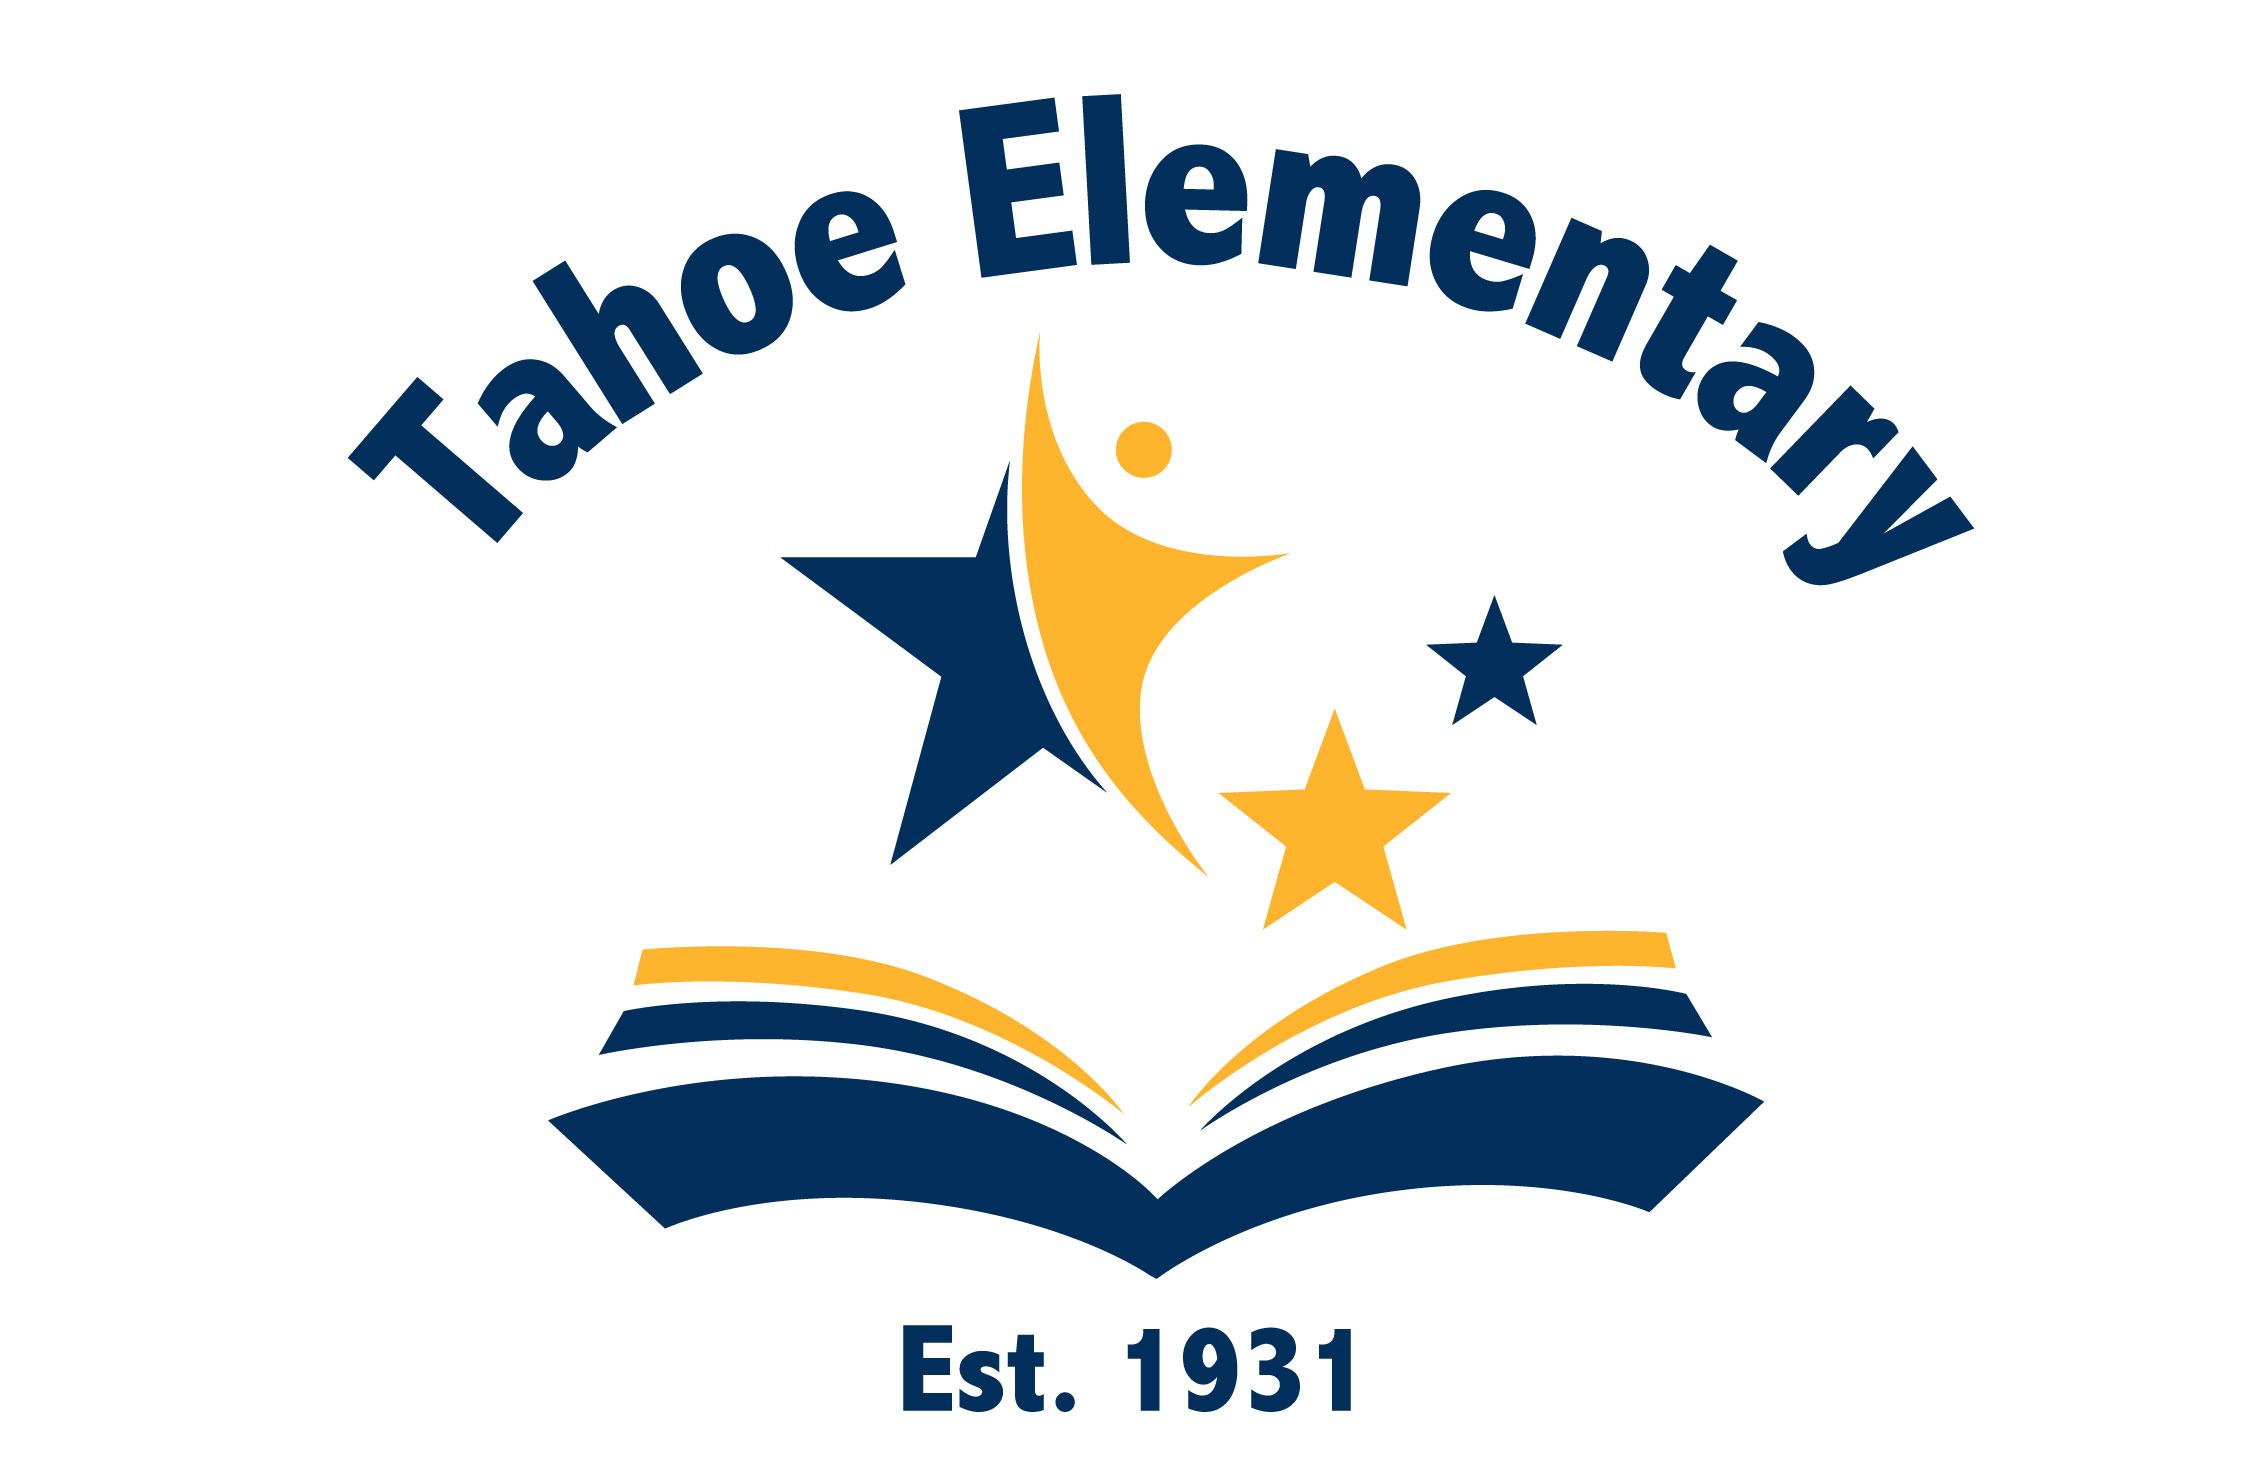 Tahoe Elementary School